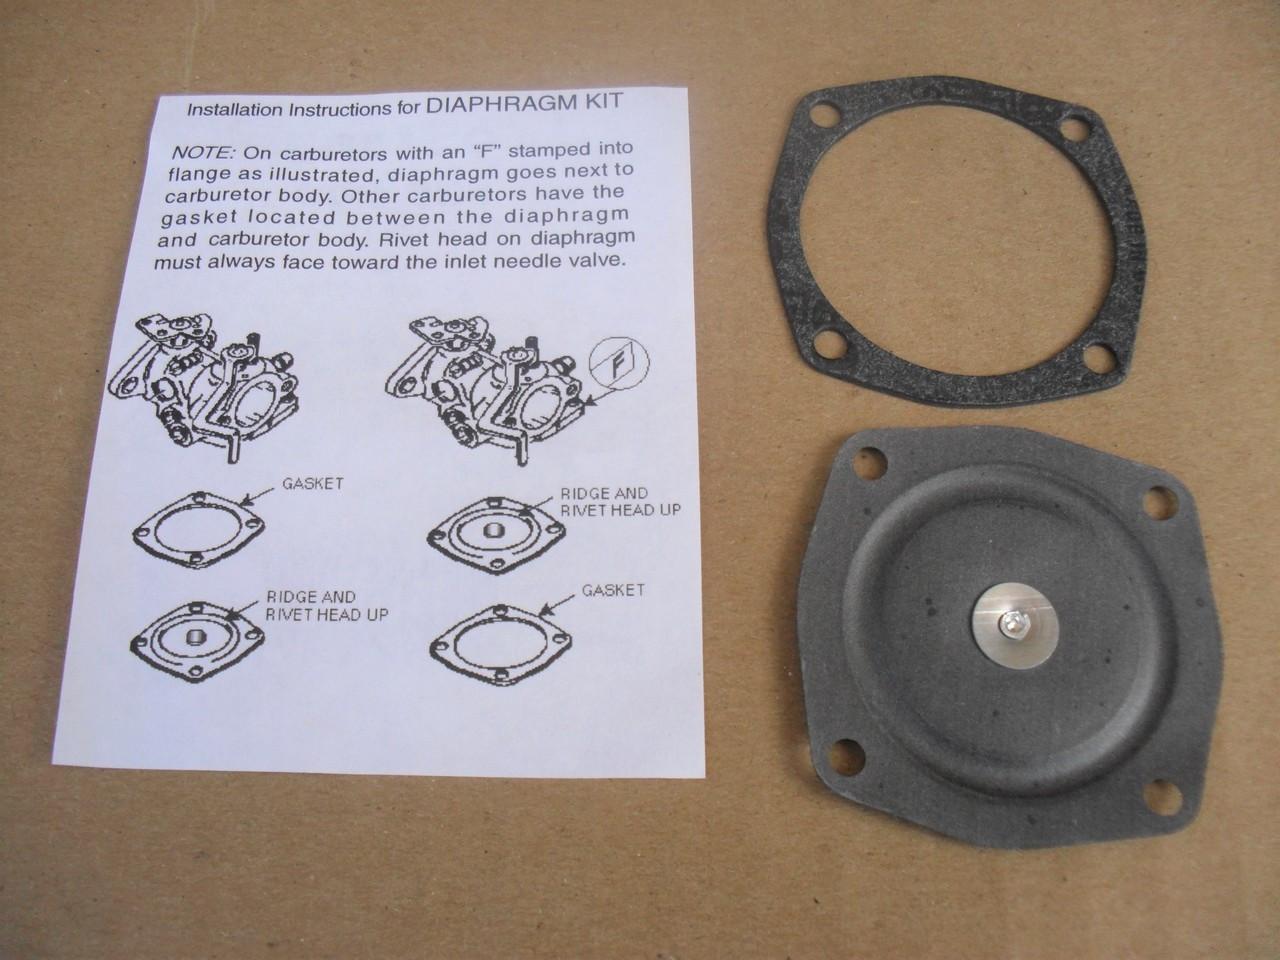 Carburetor Diaphragm Rebuild Kit for Tecumseh AV520, H30, LAV40, 1400, 1500  Jiffy